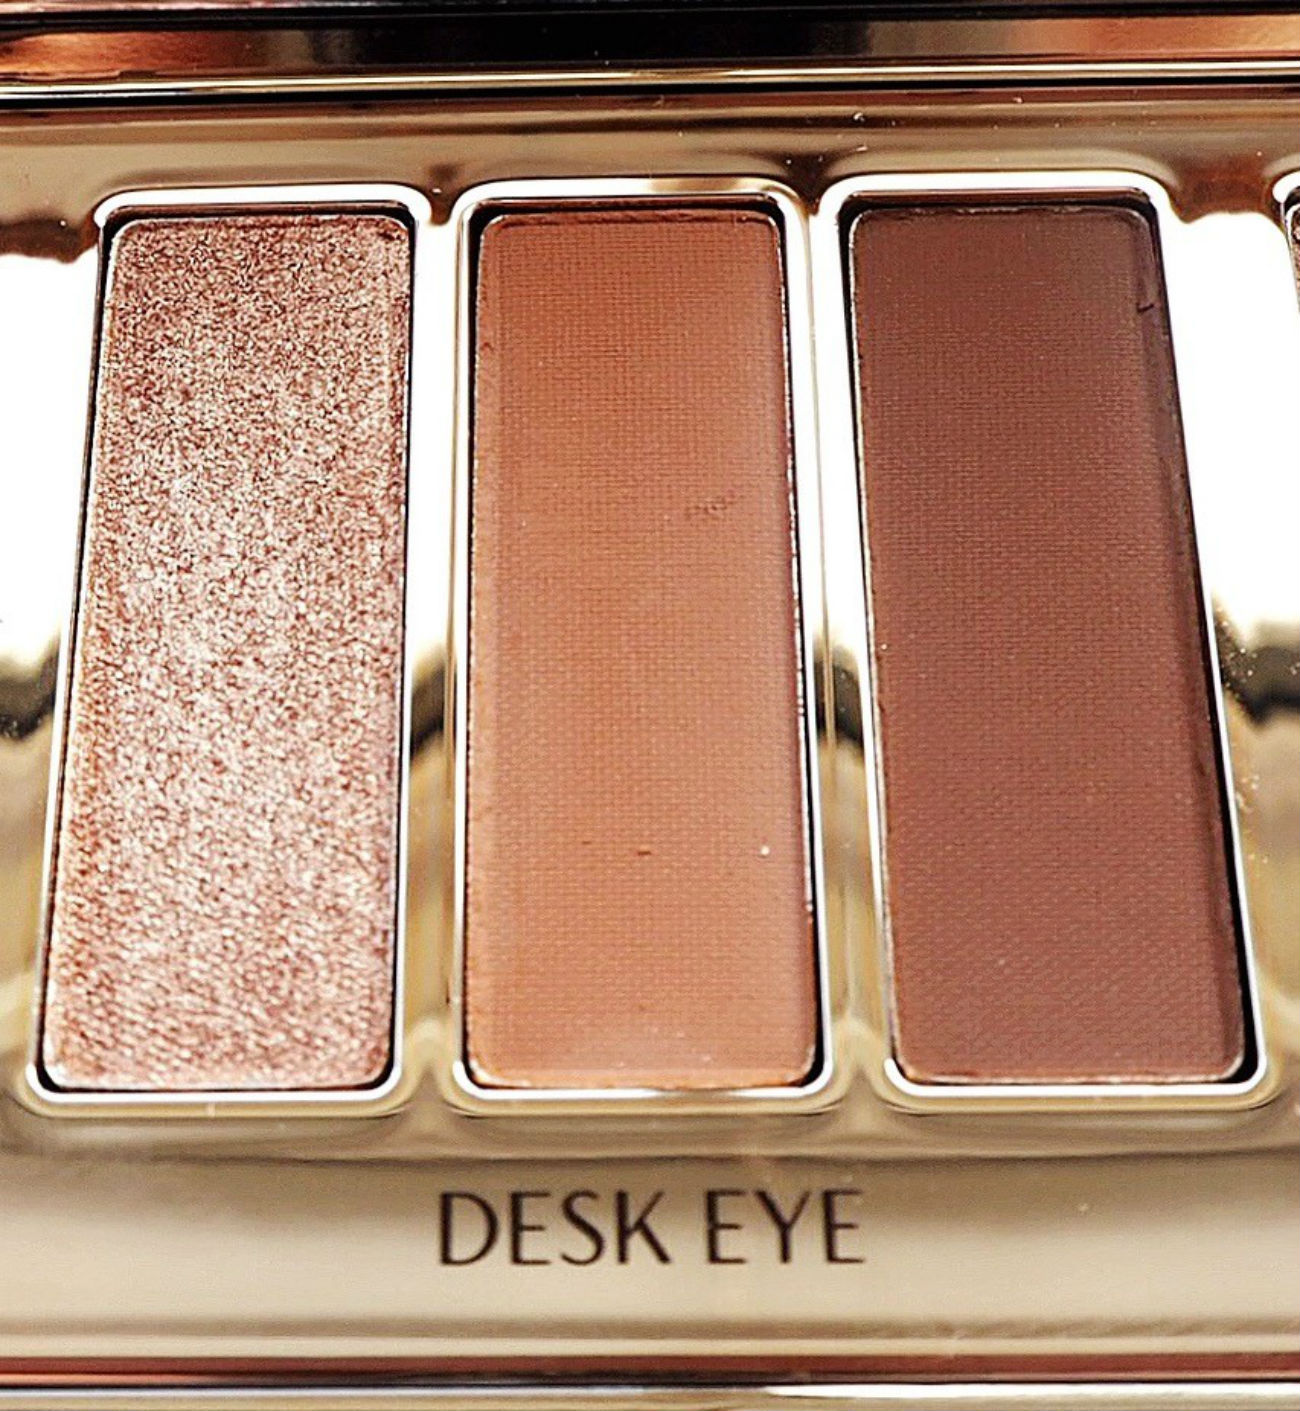 Charlotte Tilbury Instant Eye Palette, swatch, shades